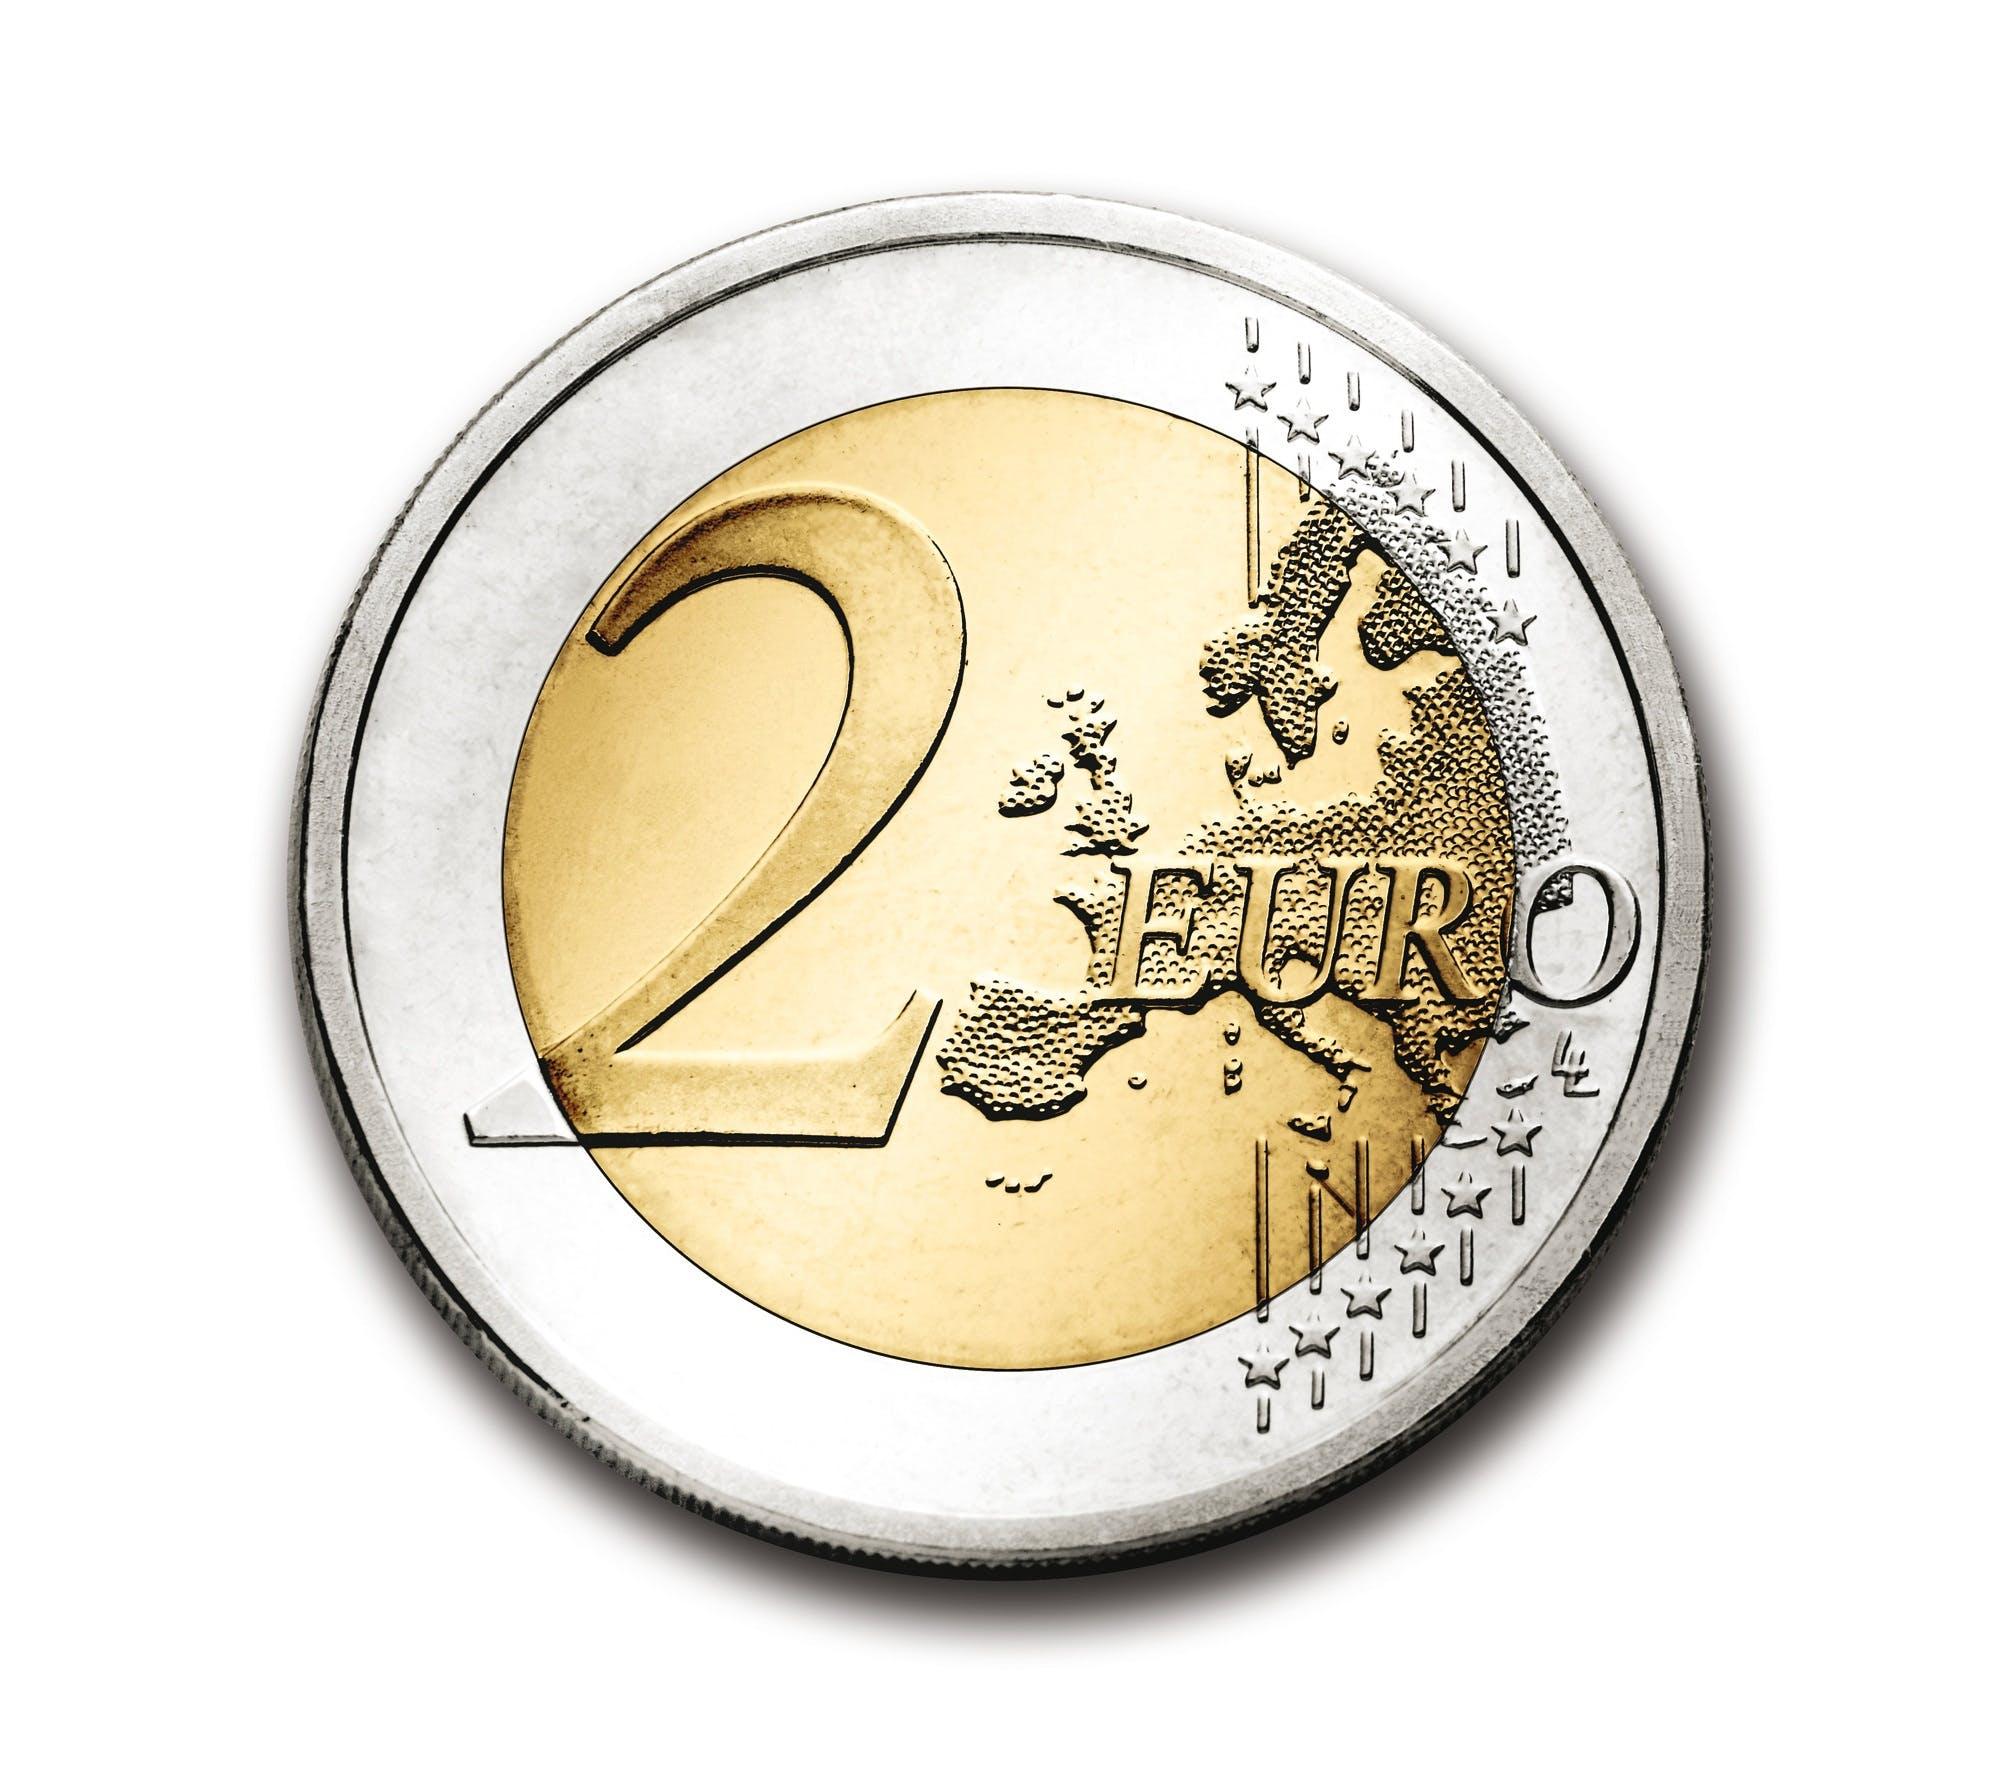 2 euro, Avrupa, euro, madeni para içeren Ücretsiz stok fotoğraf